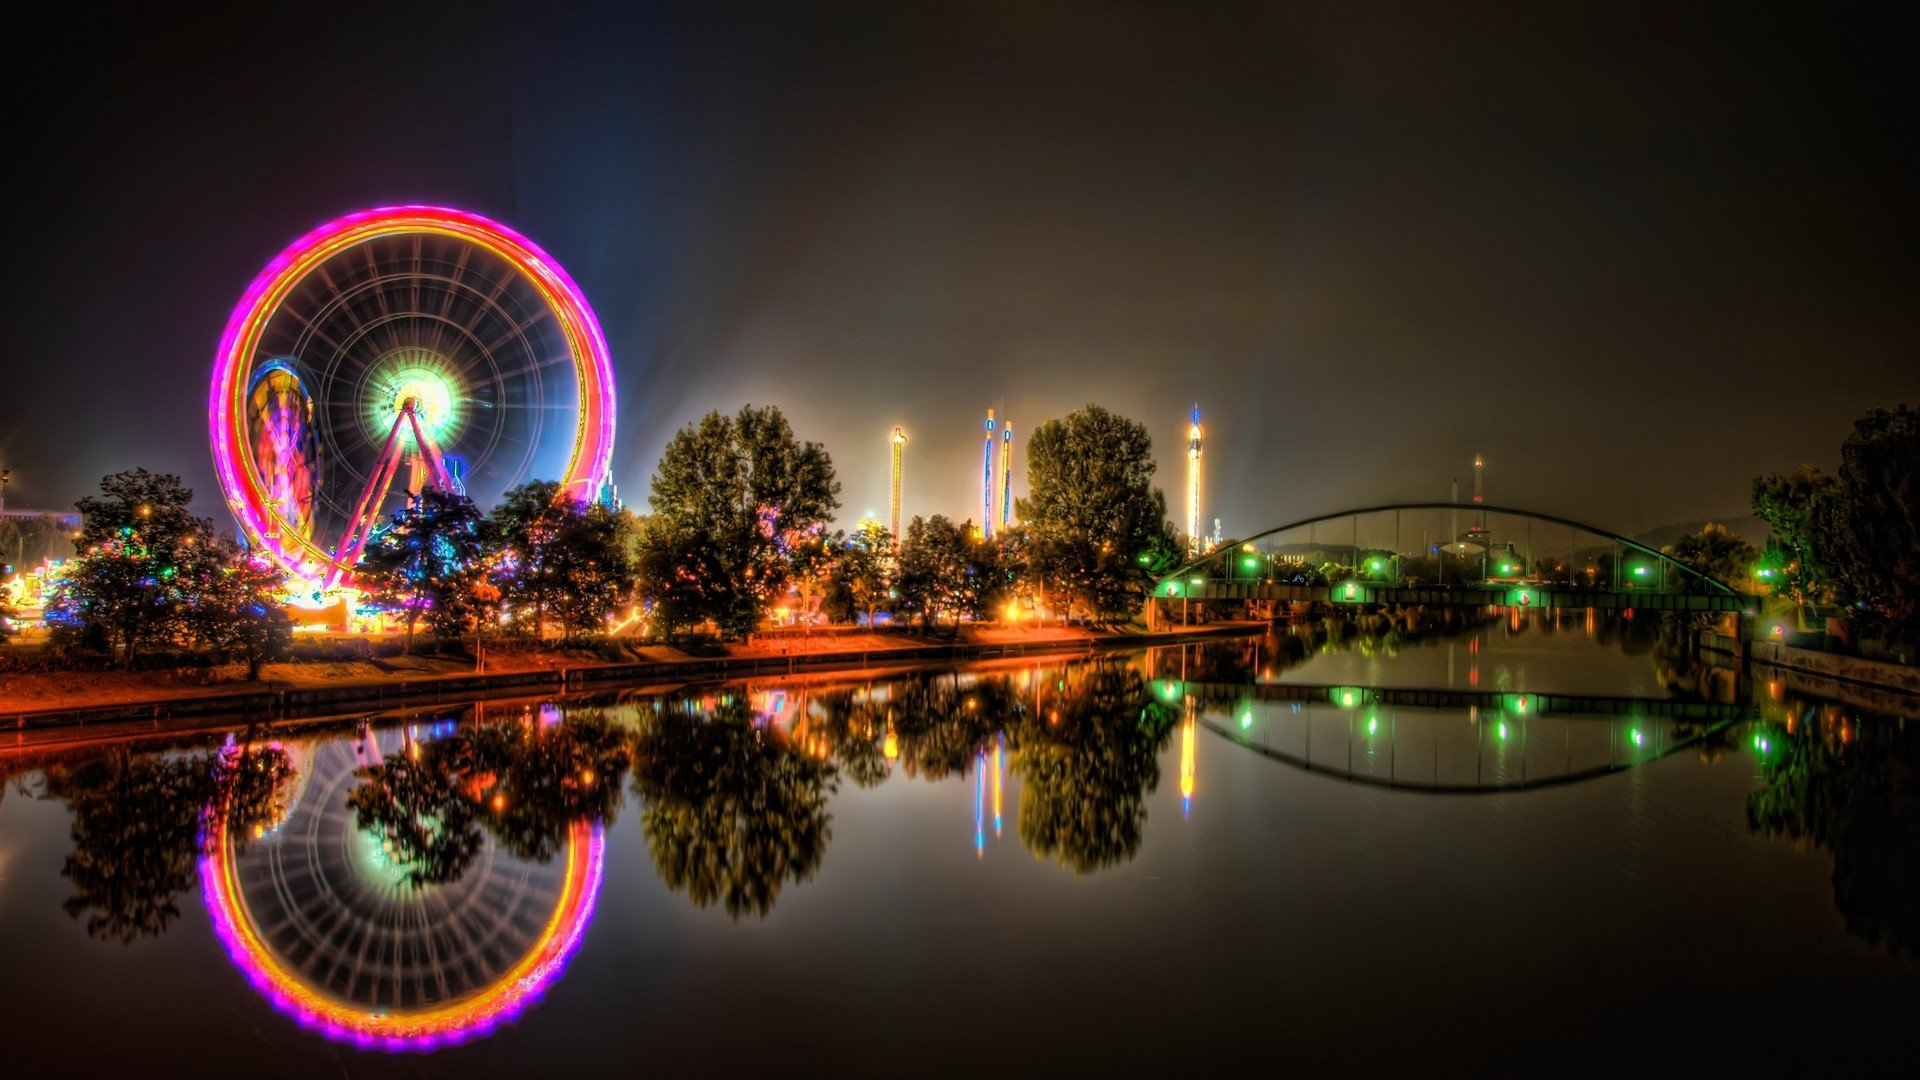 Urban amusement park ferris wheels HDR photography ...